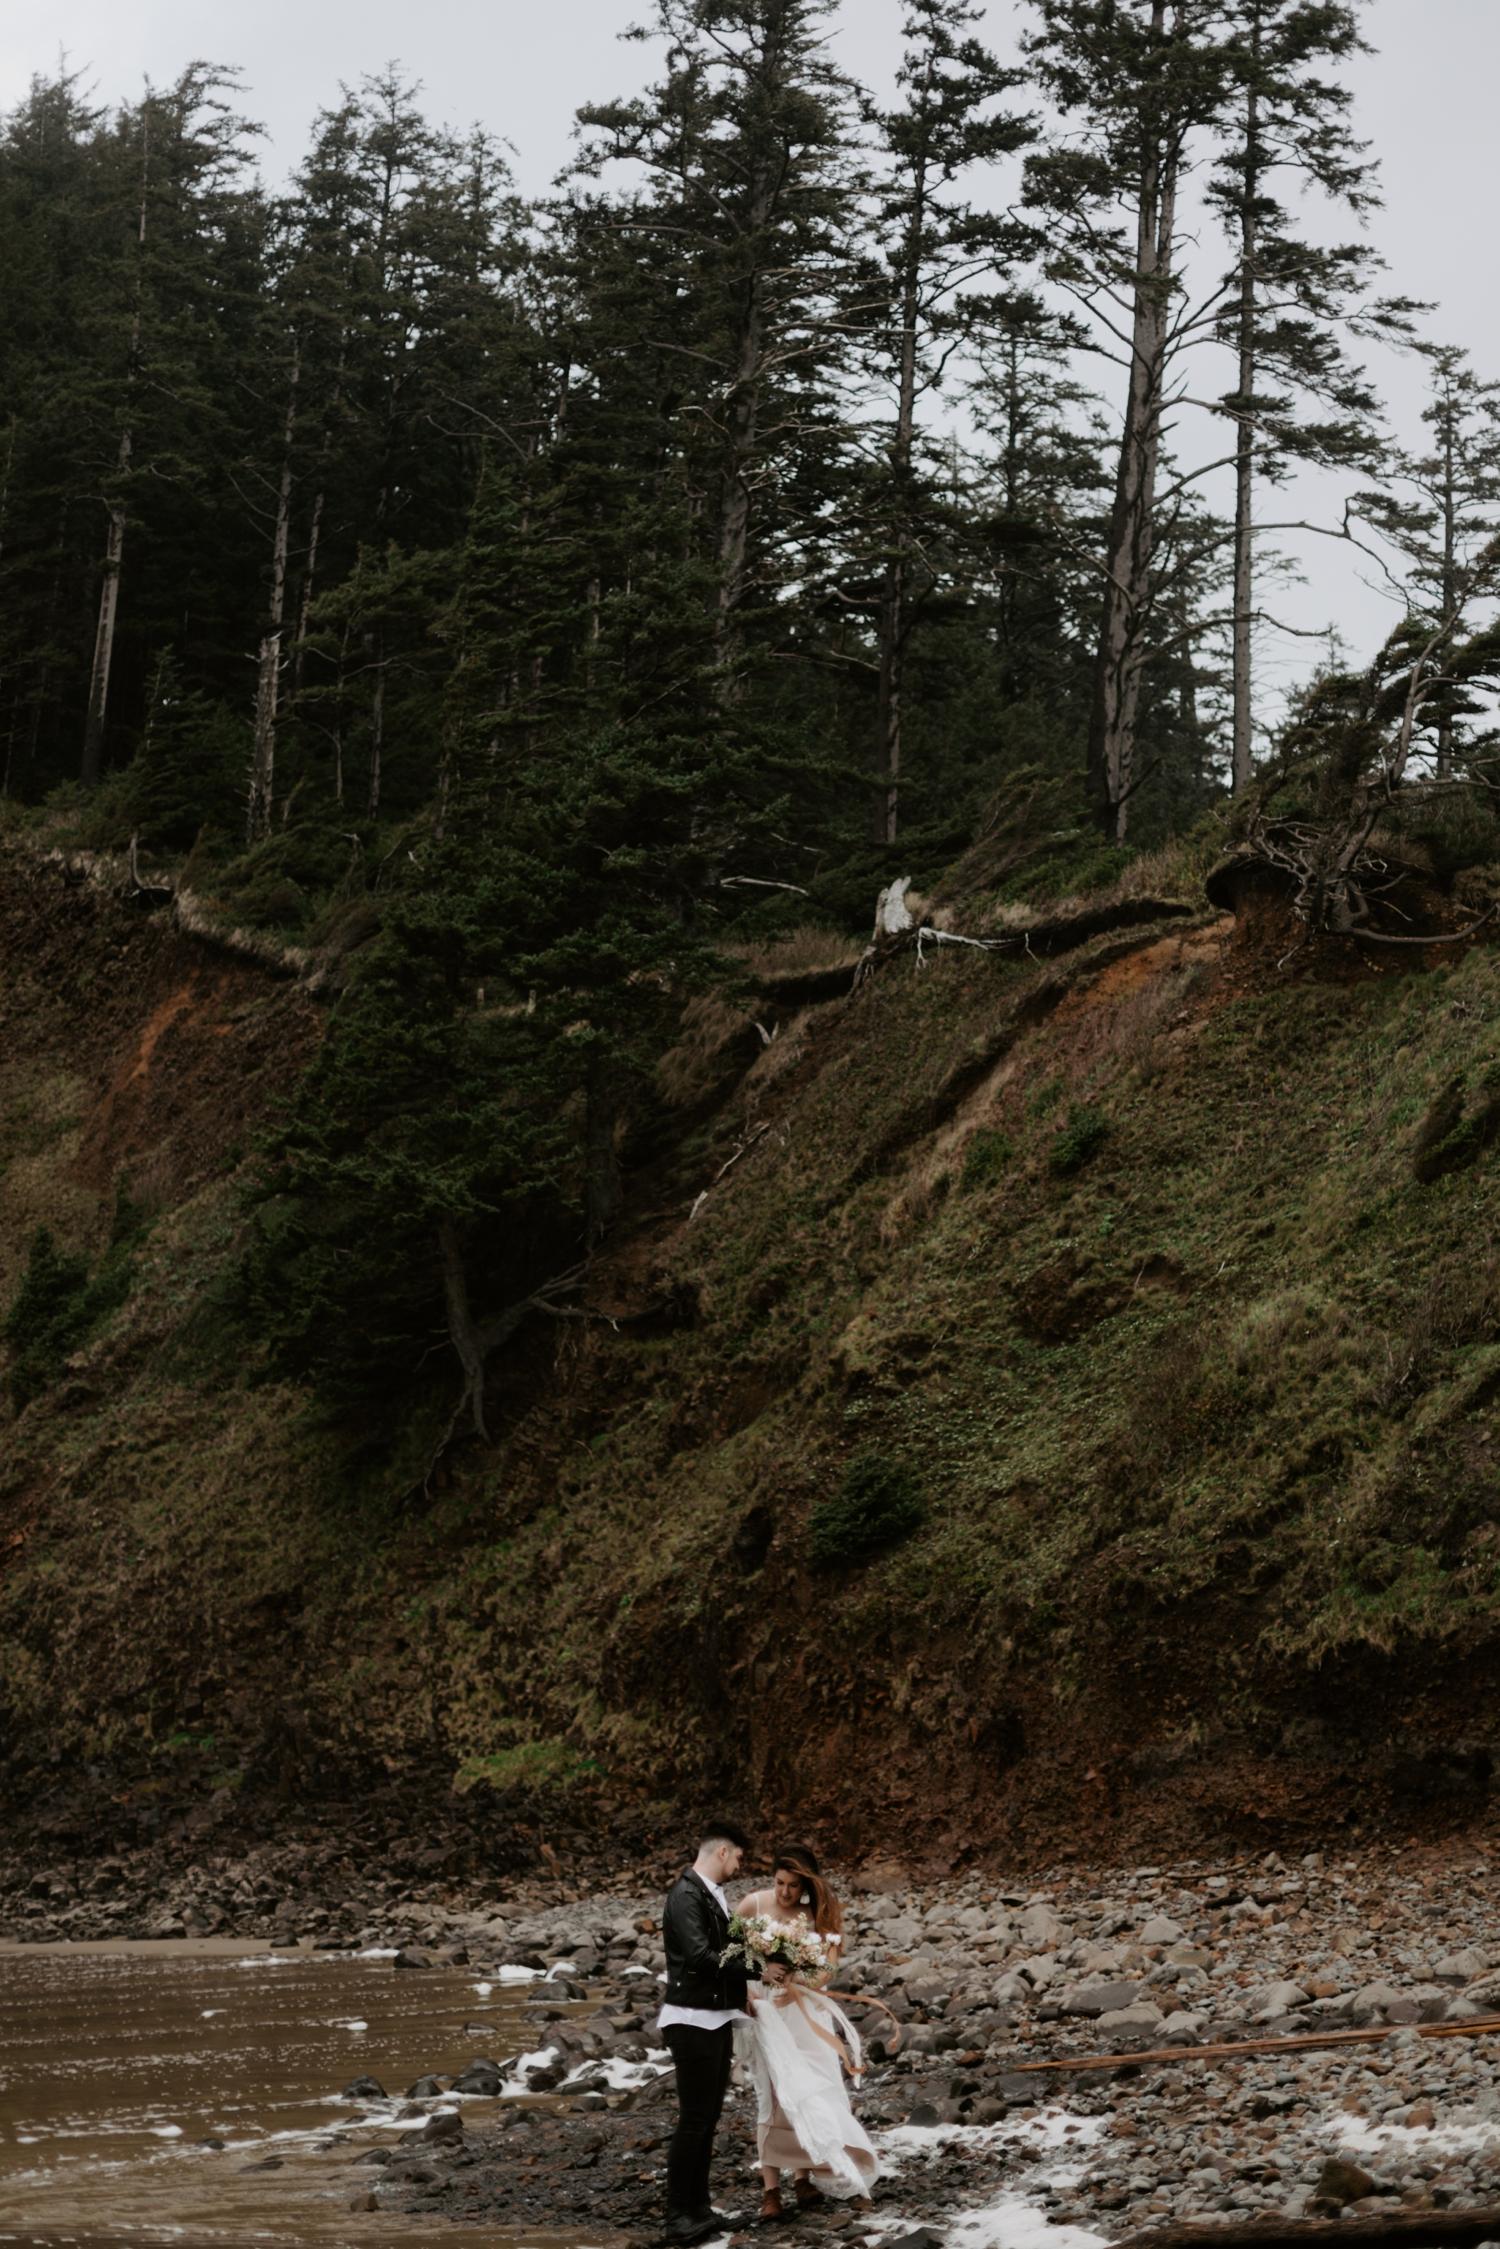 intimate-oregon-coast-elopement-2018-04-26_0003.jpg